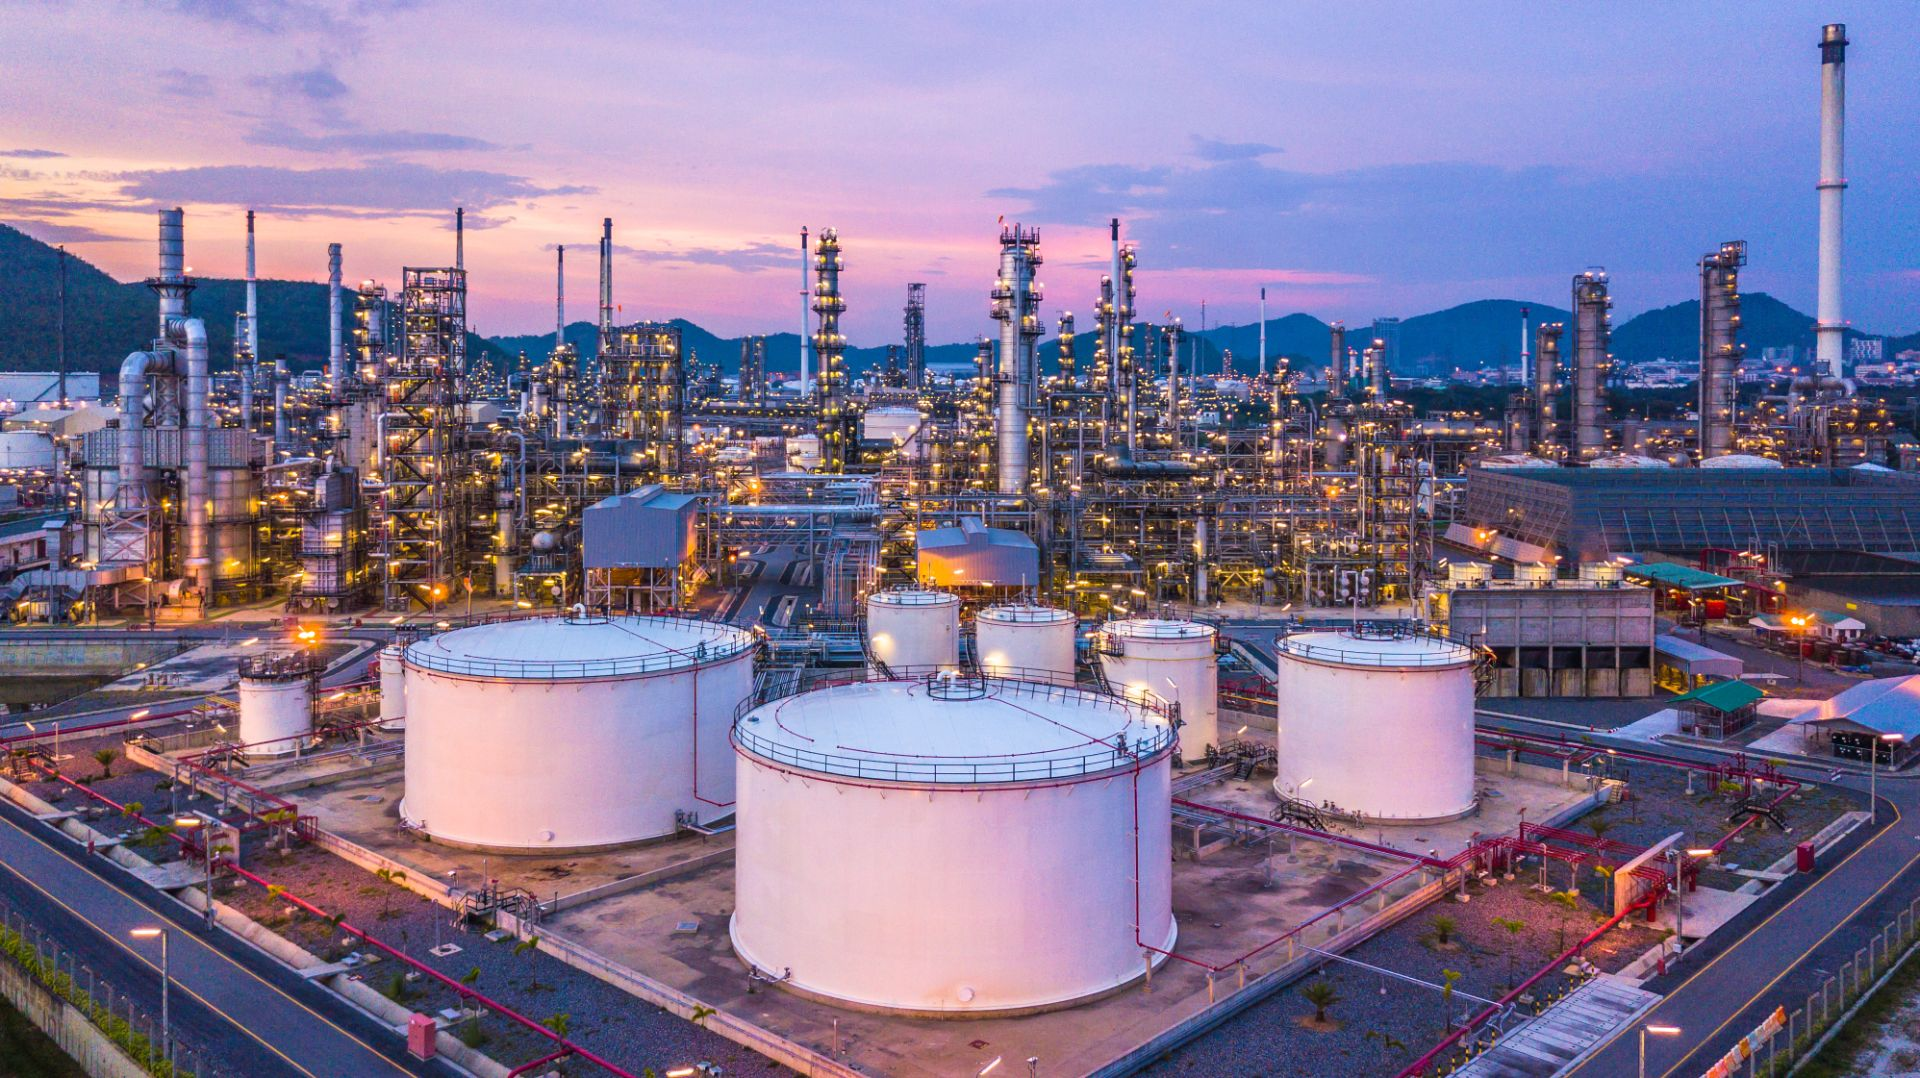 refinaria de petroleo vista aerea shutterstock